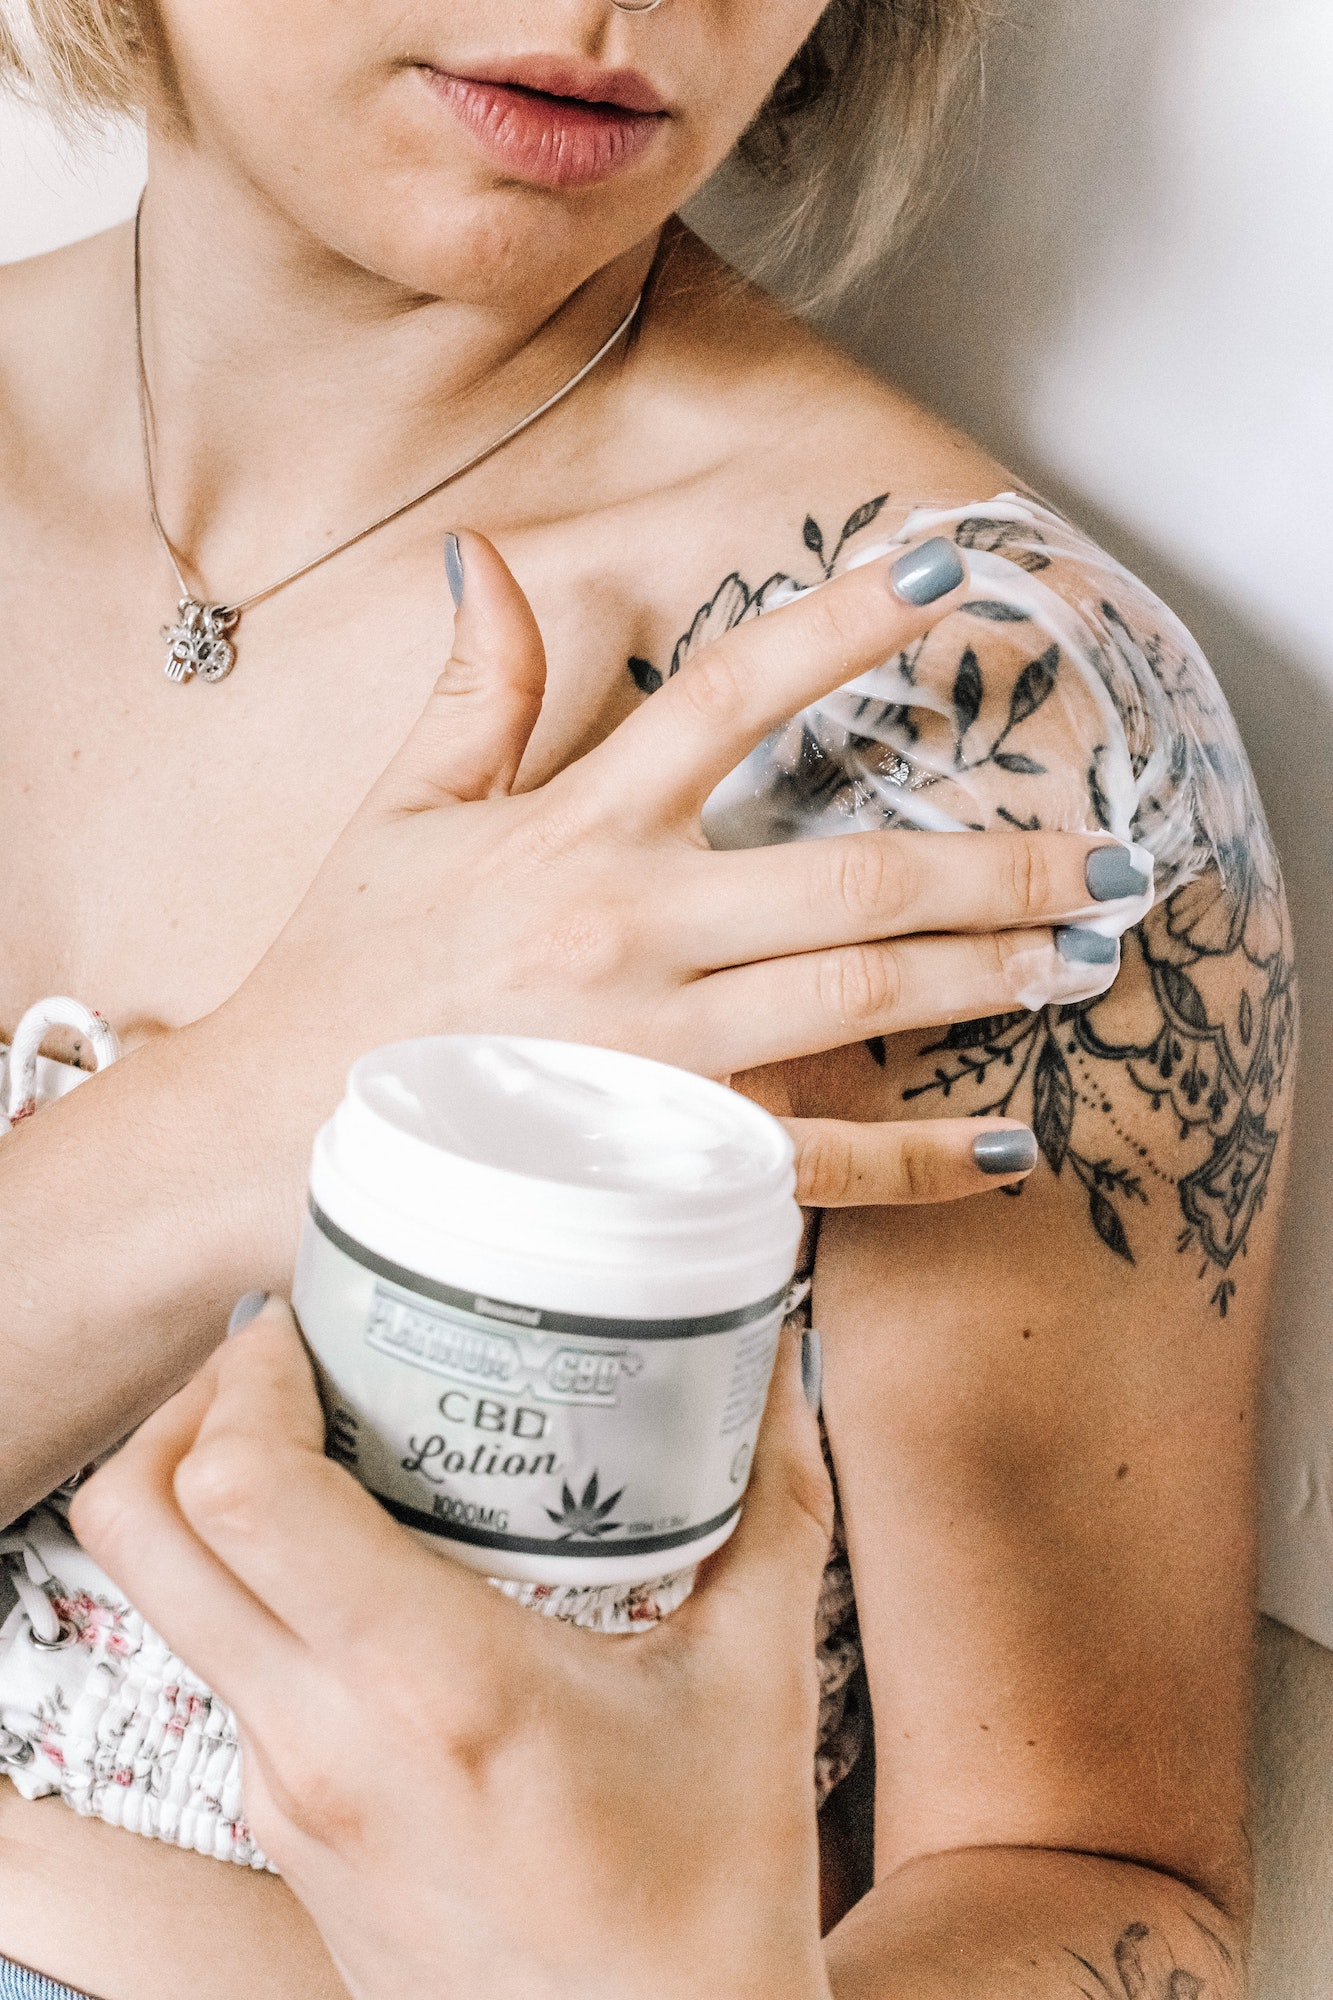 CBD Oil   Chronic Pain Natural Remedies To Try   Health   Elle Blonde Luxury Lifestyle Destination Blog